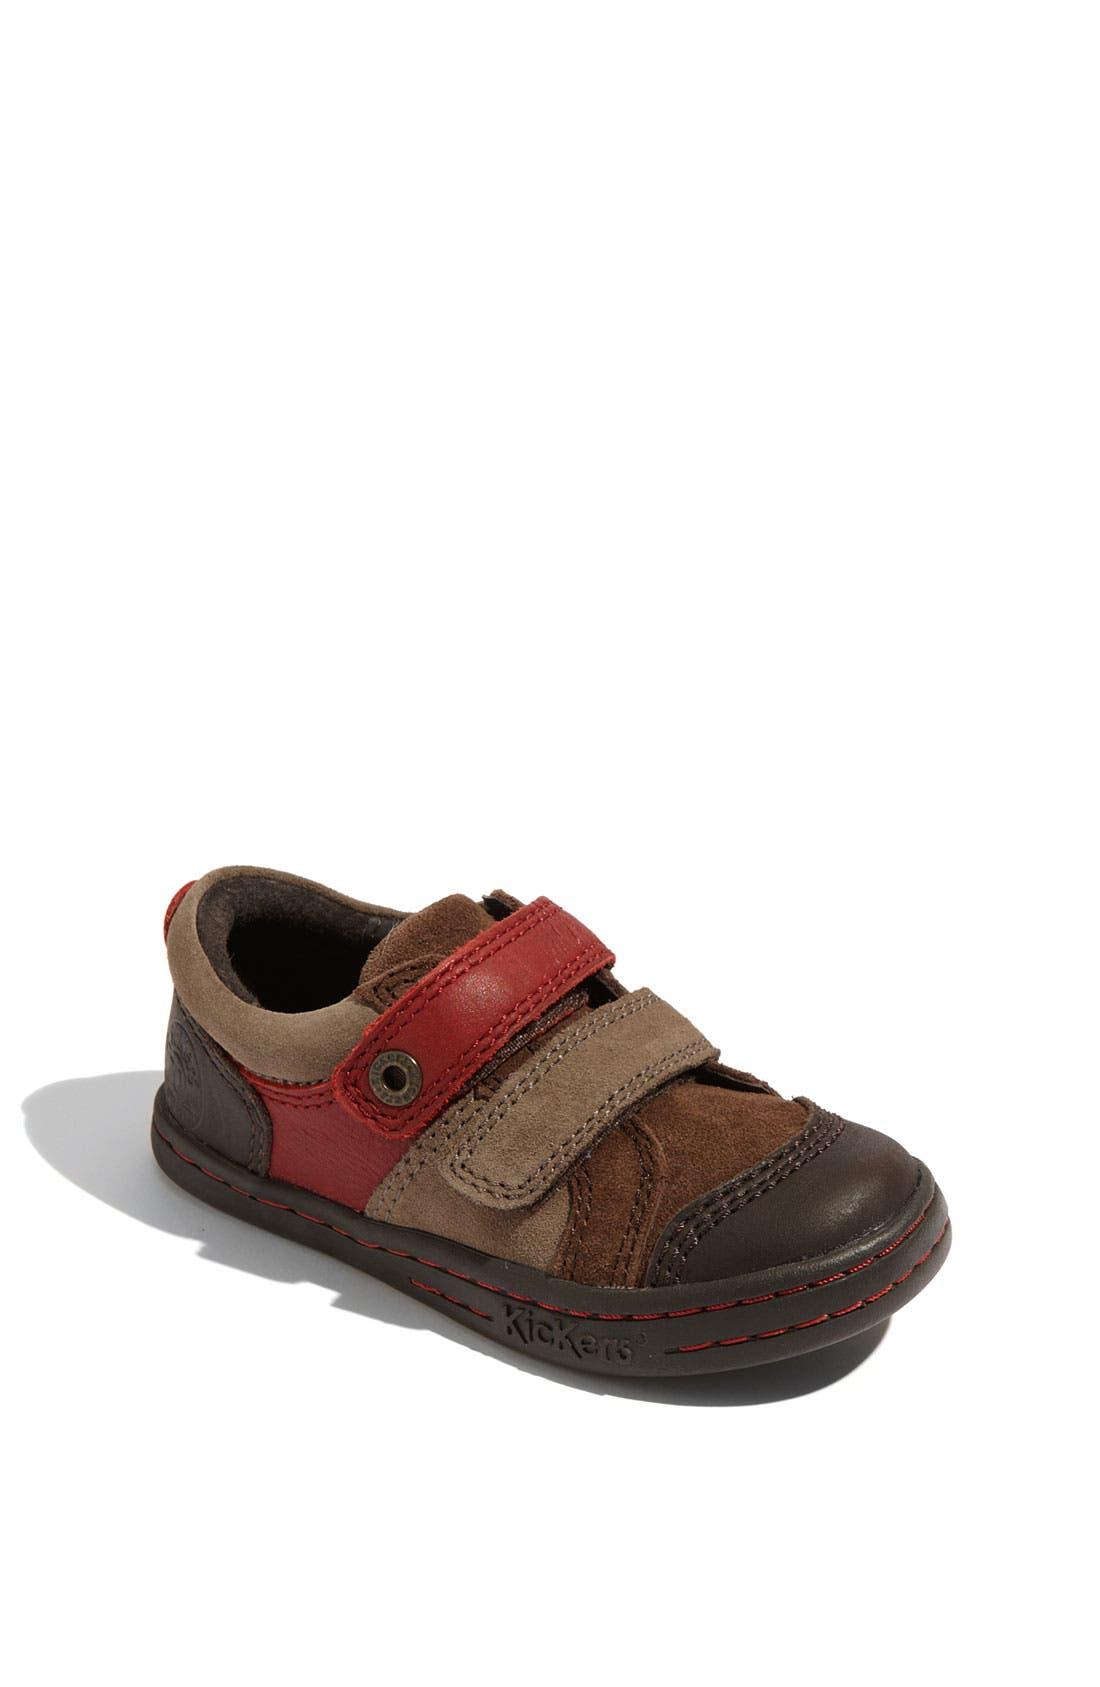 Main Image - Kickers 'Jump' Shoe (Toddler)